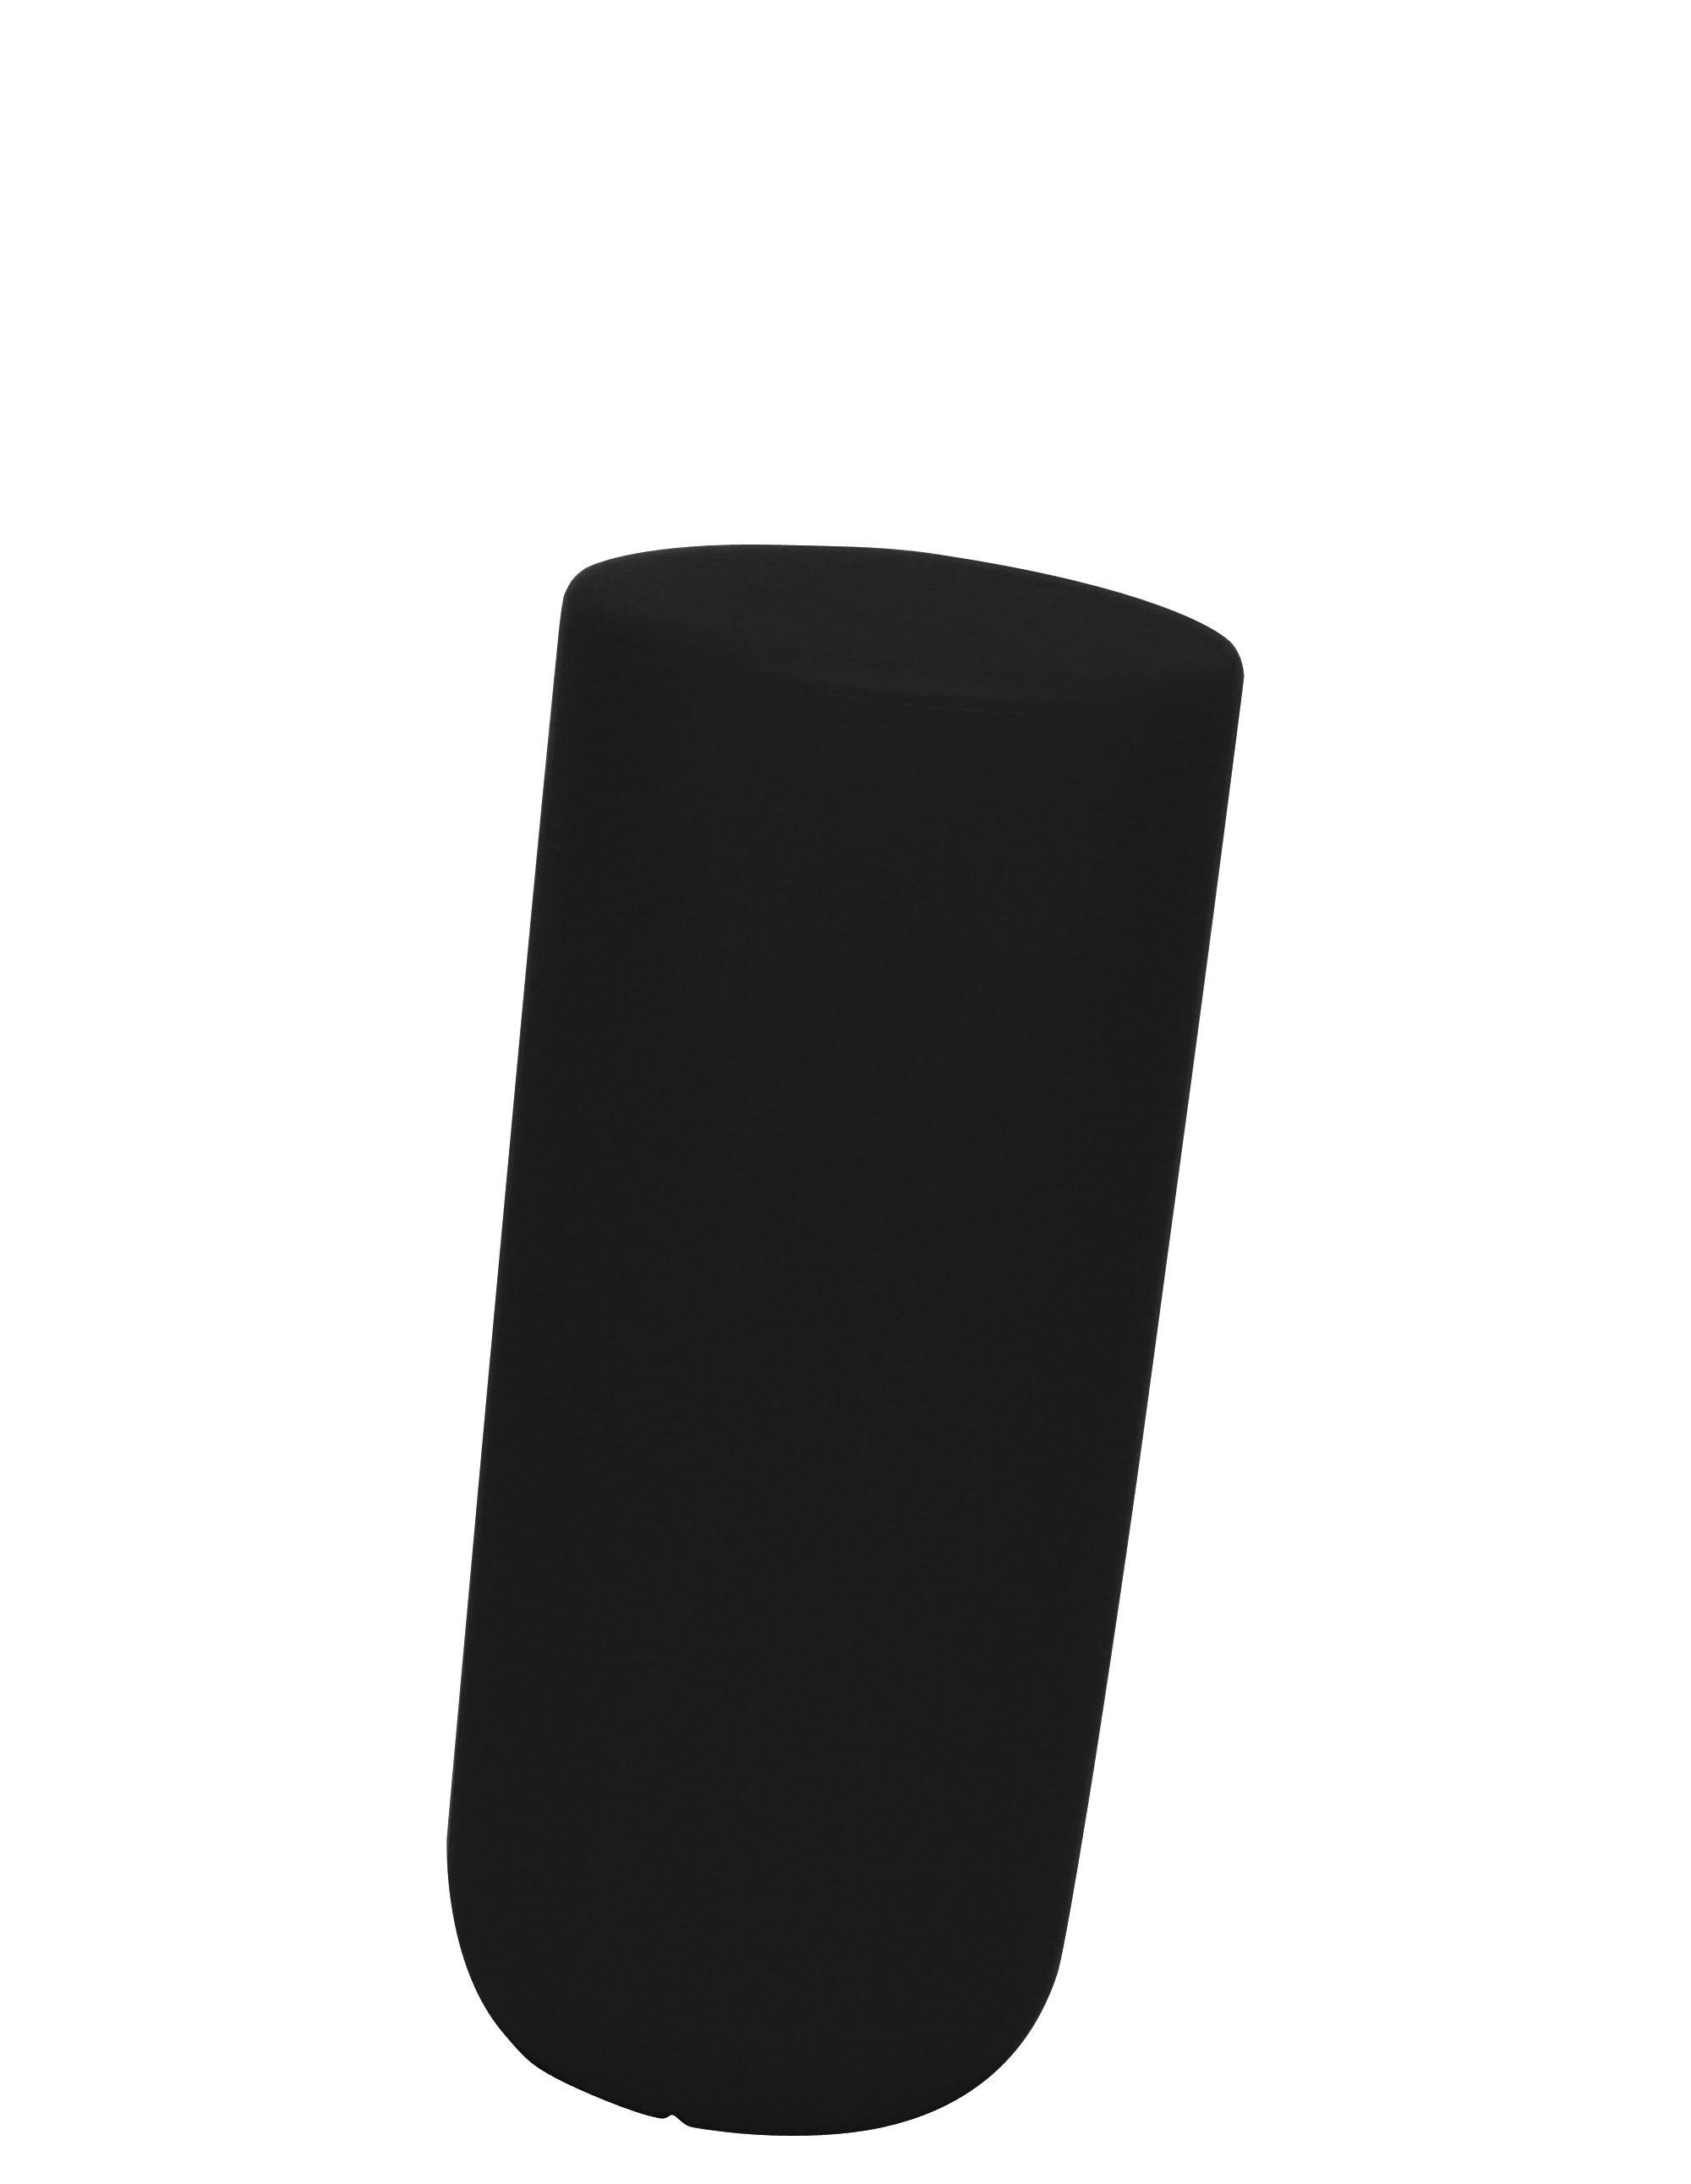 Furniture - Teen furniture - Sway Stool - H 50 cm by Thelermont Hupton - Black - Polythene